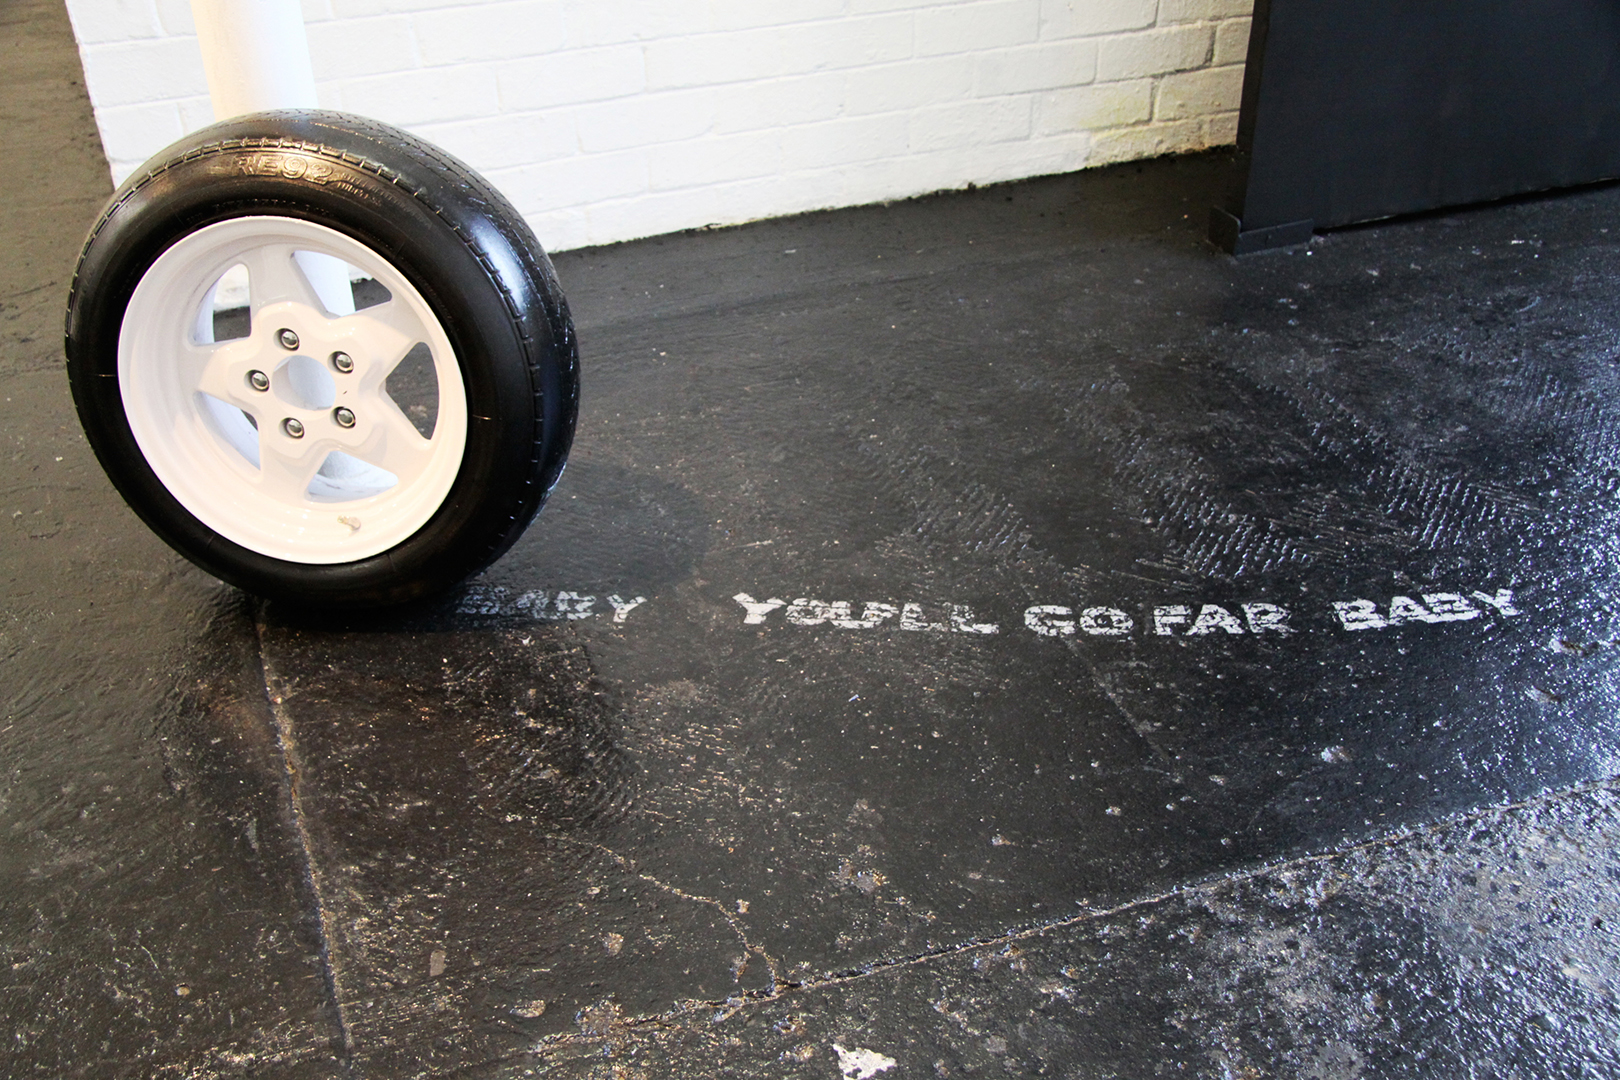 H.W.Y dreams (you'll go far baby)  car tyre relief print  dimensions variable